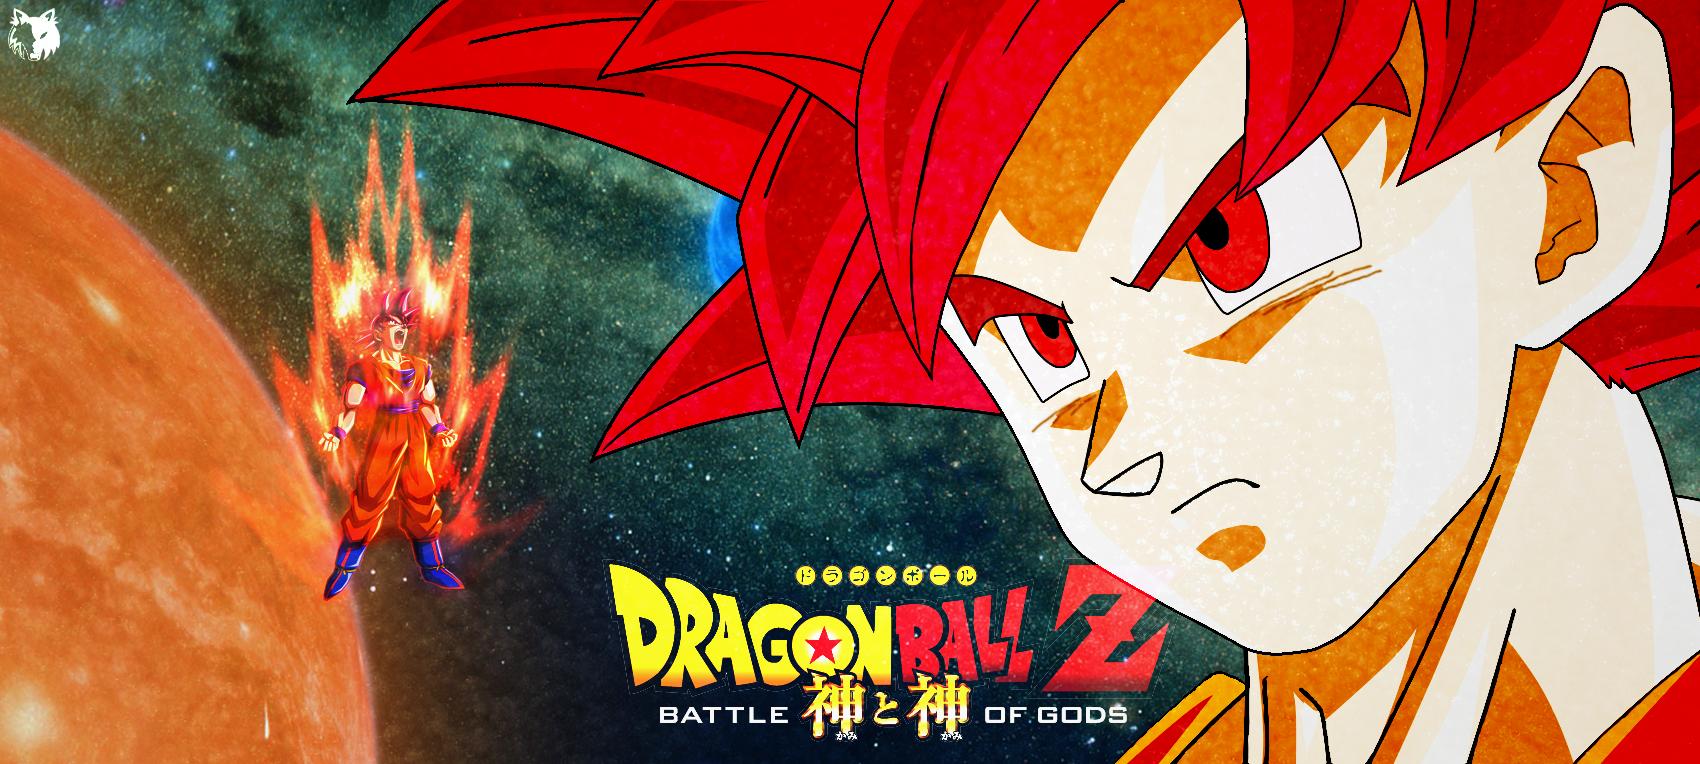 dragon ball super all gods wallpapers.html